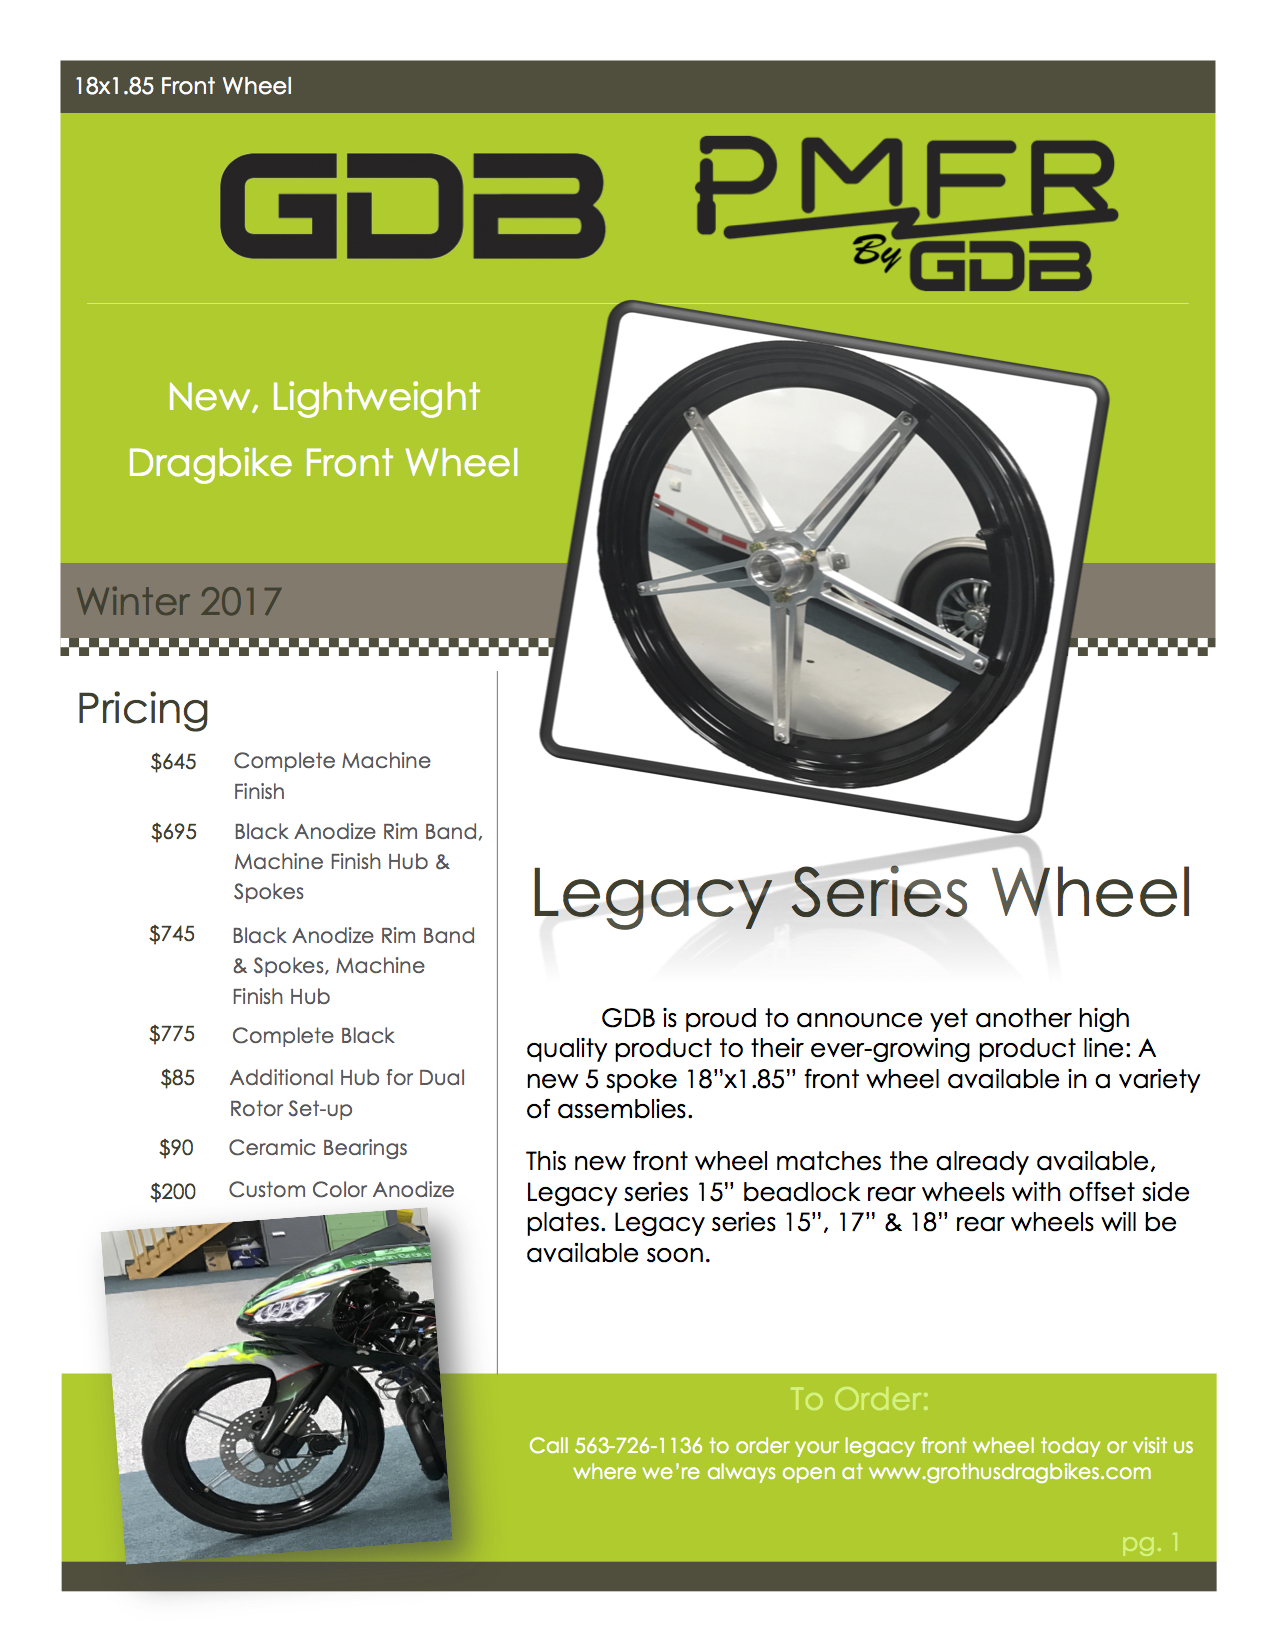 Grothus Dragbikes Legacy Series Front Wheel Dragbike News